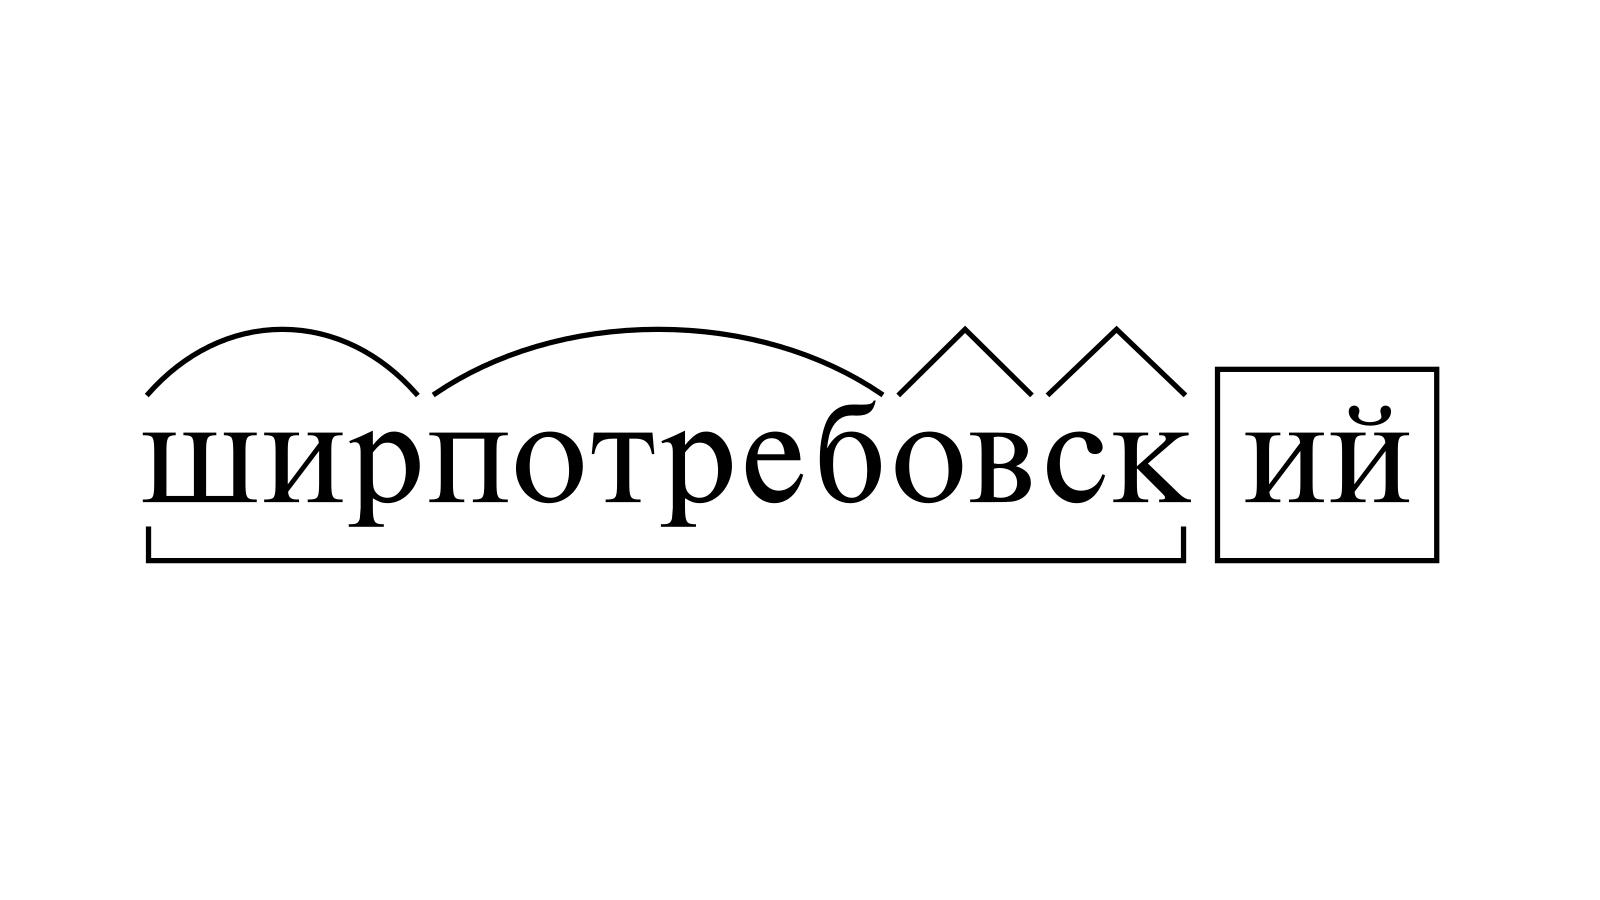 Разбор слова «ширпотребовский» по составу